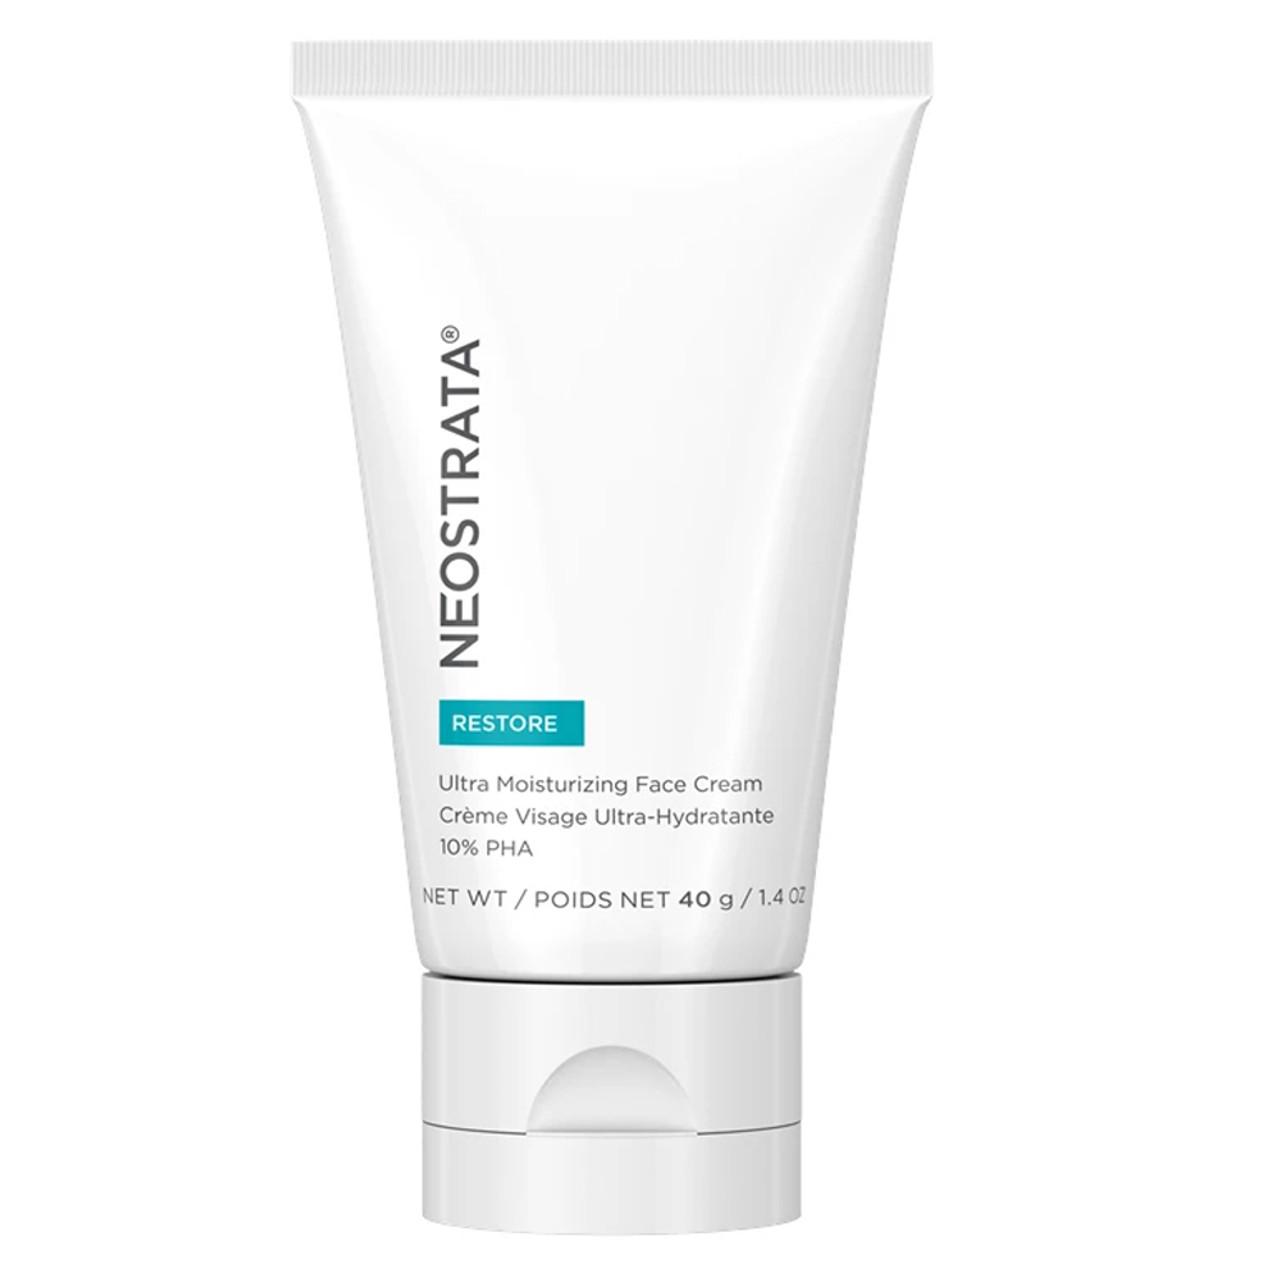 NeoStrata Ultra Moisturizing Face Cream